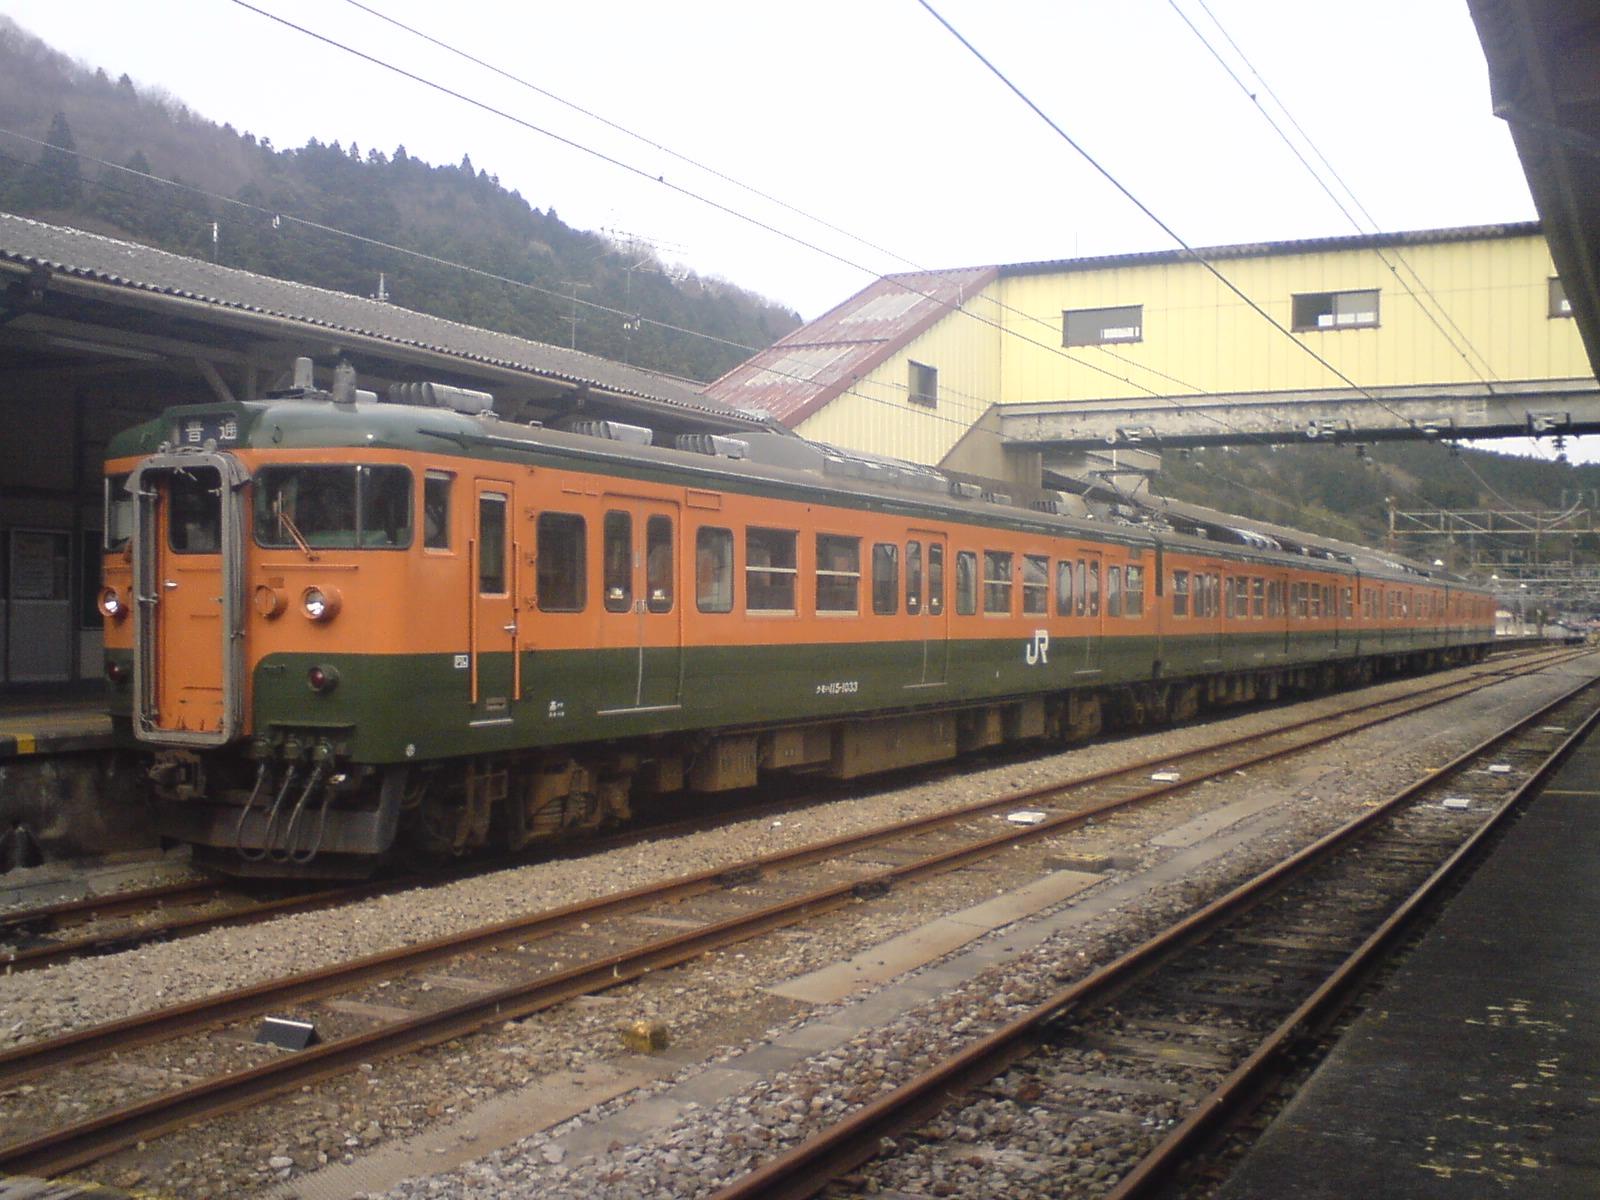 Kc380139